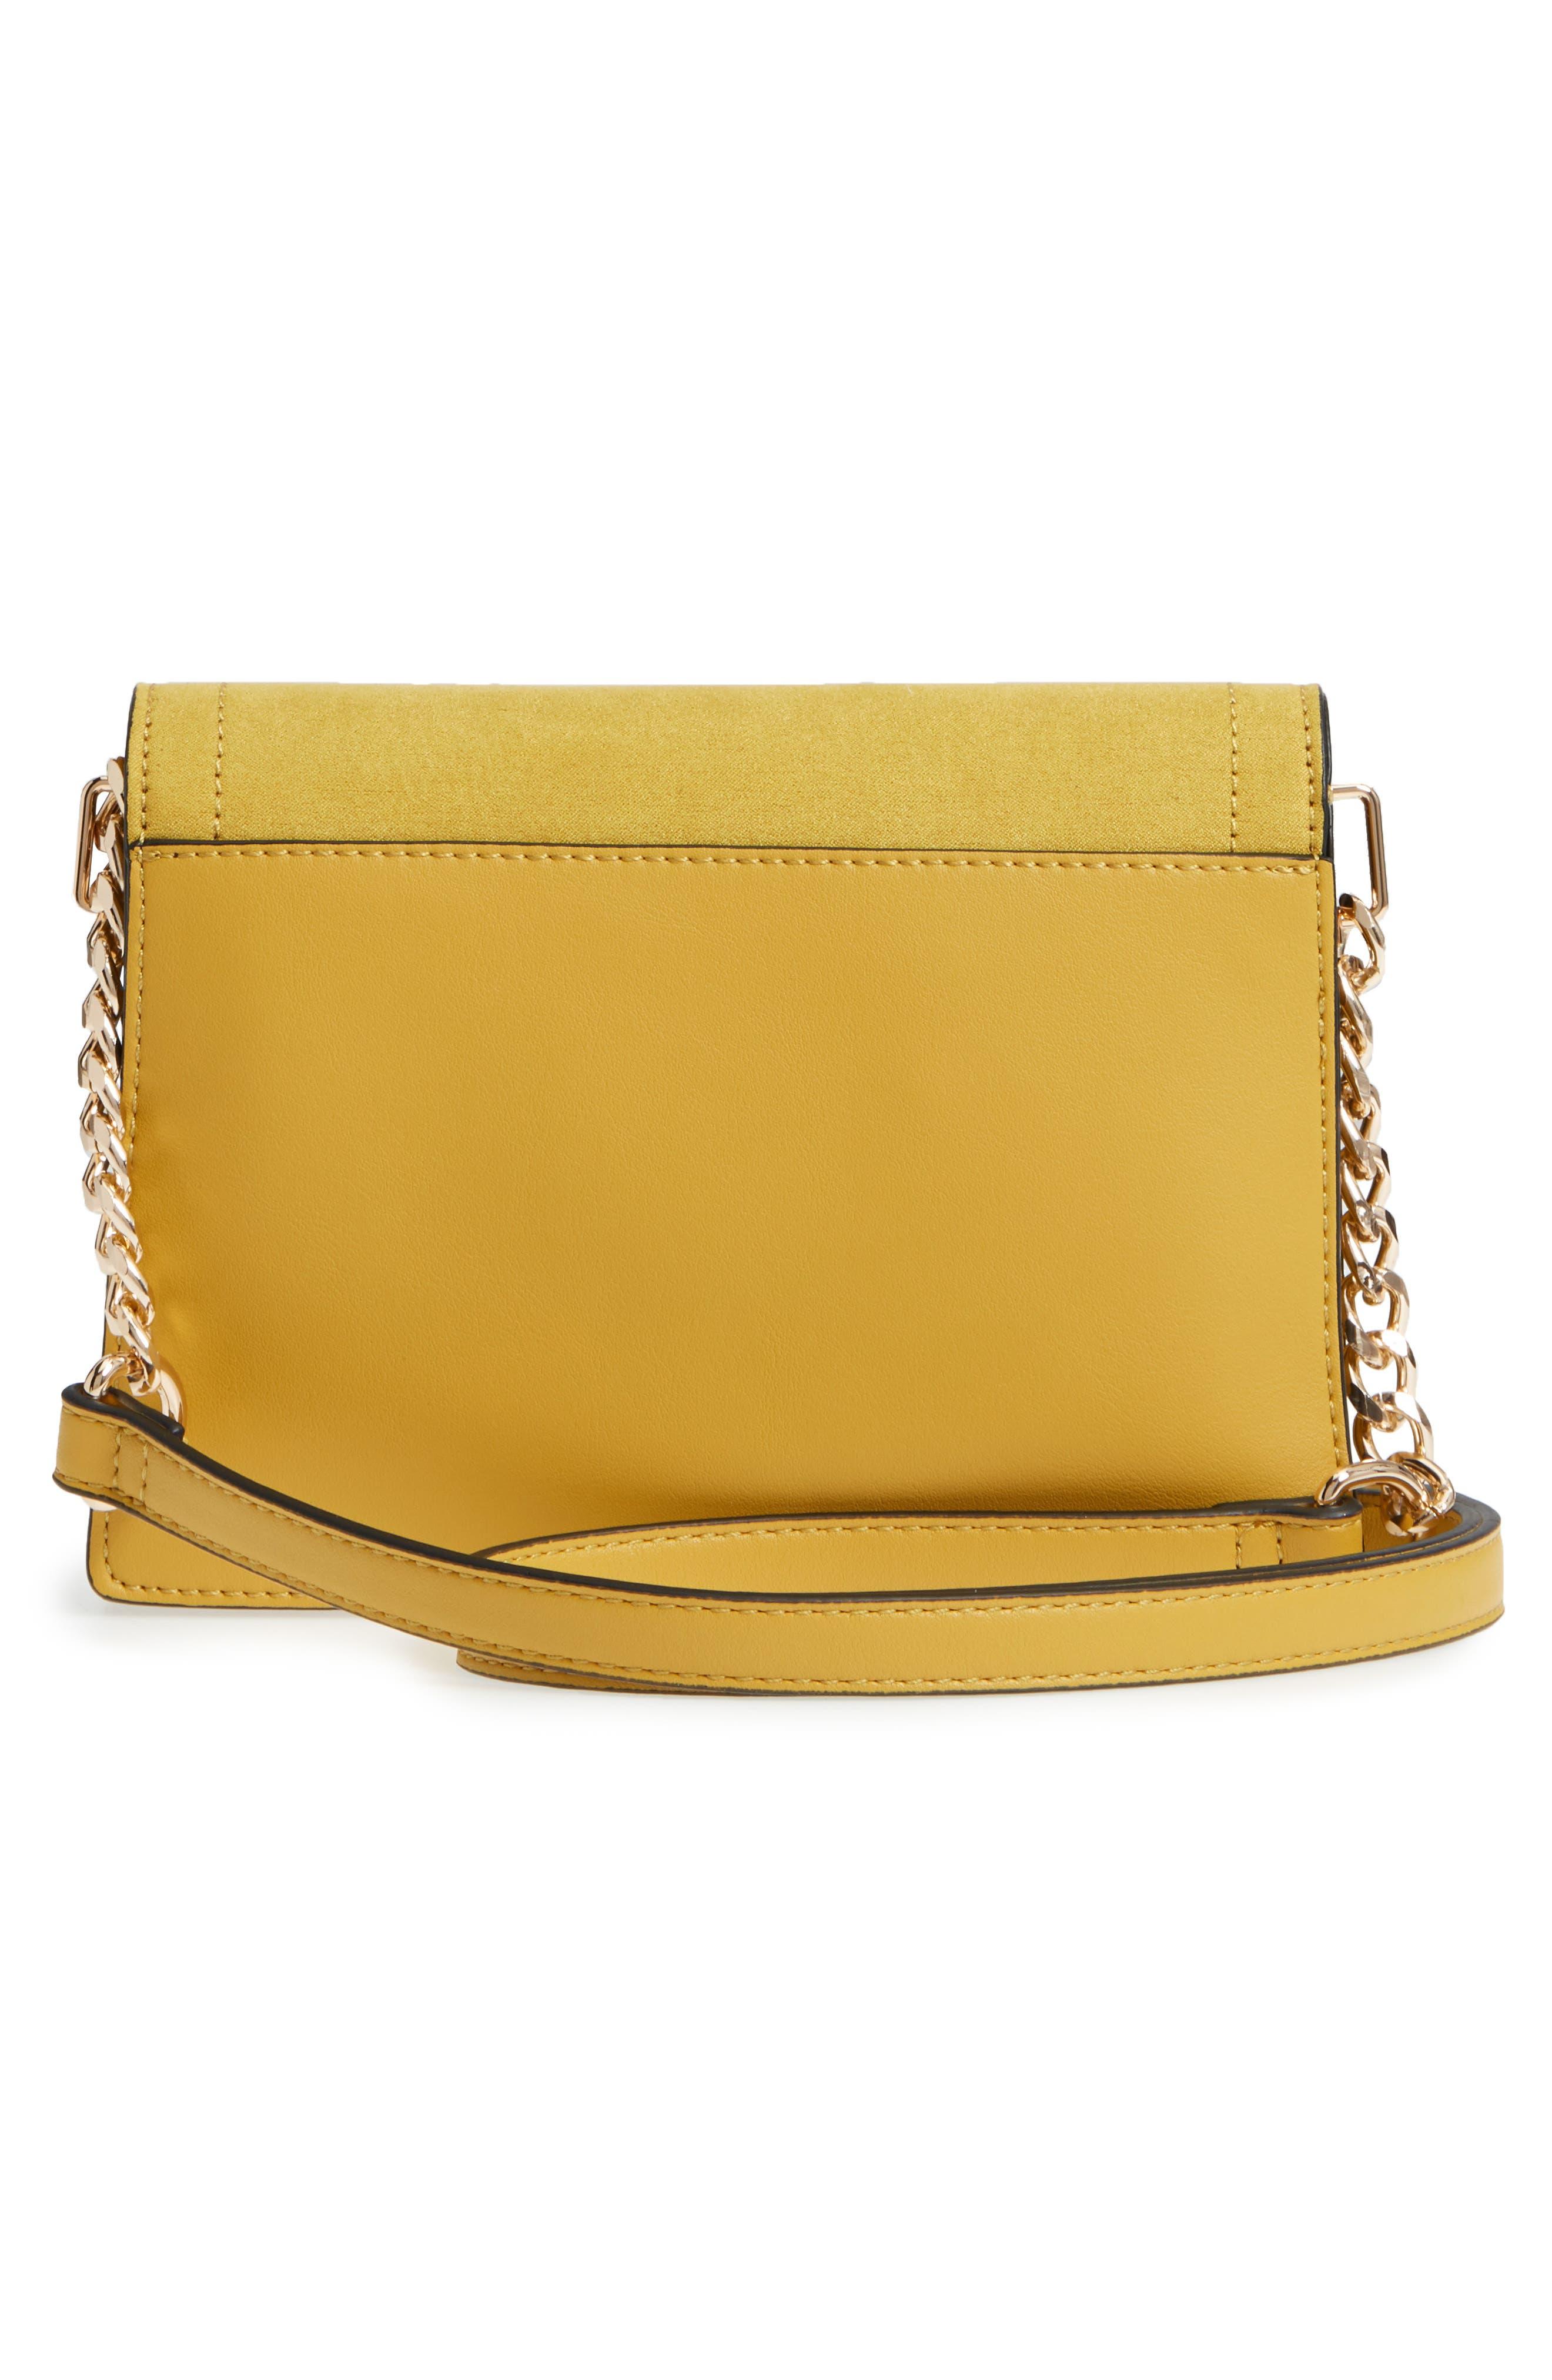 Seline Faux Leather Crossbody Bag,                             Alternate thumbnail 3, color,                             Yellow Multi